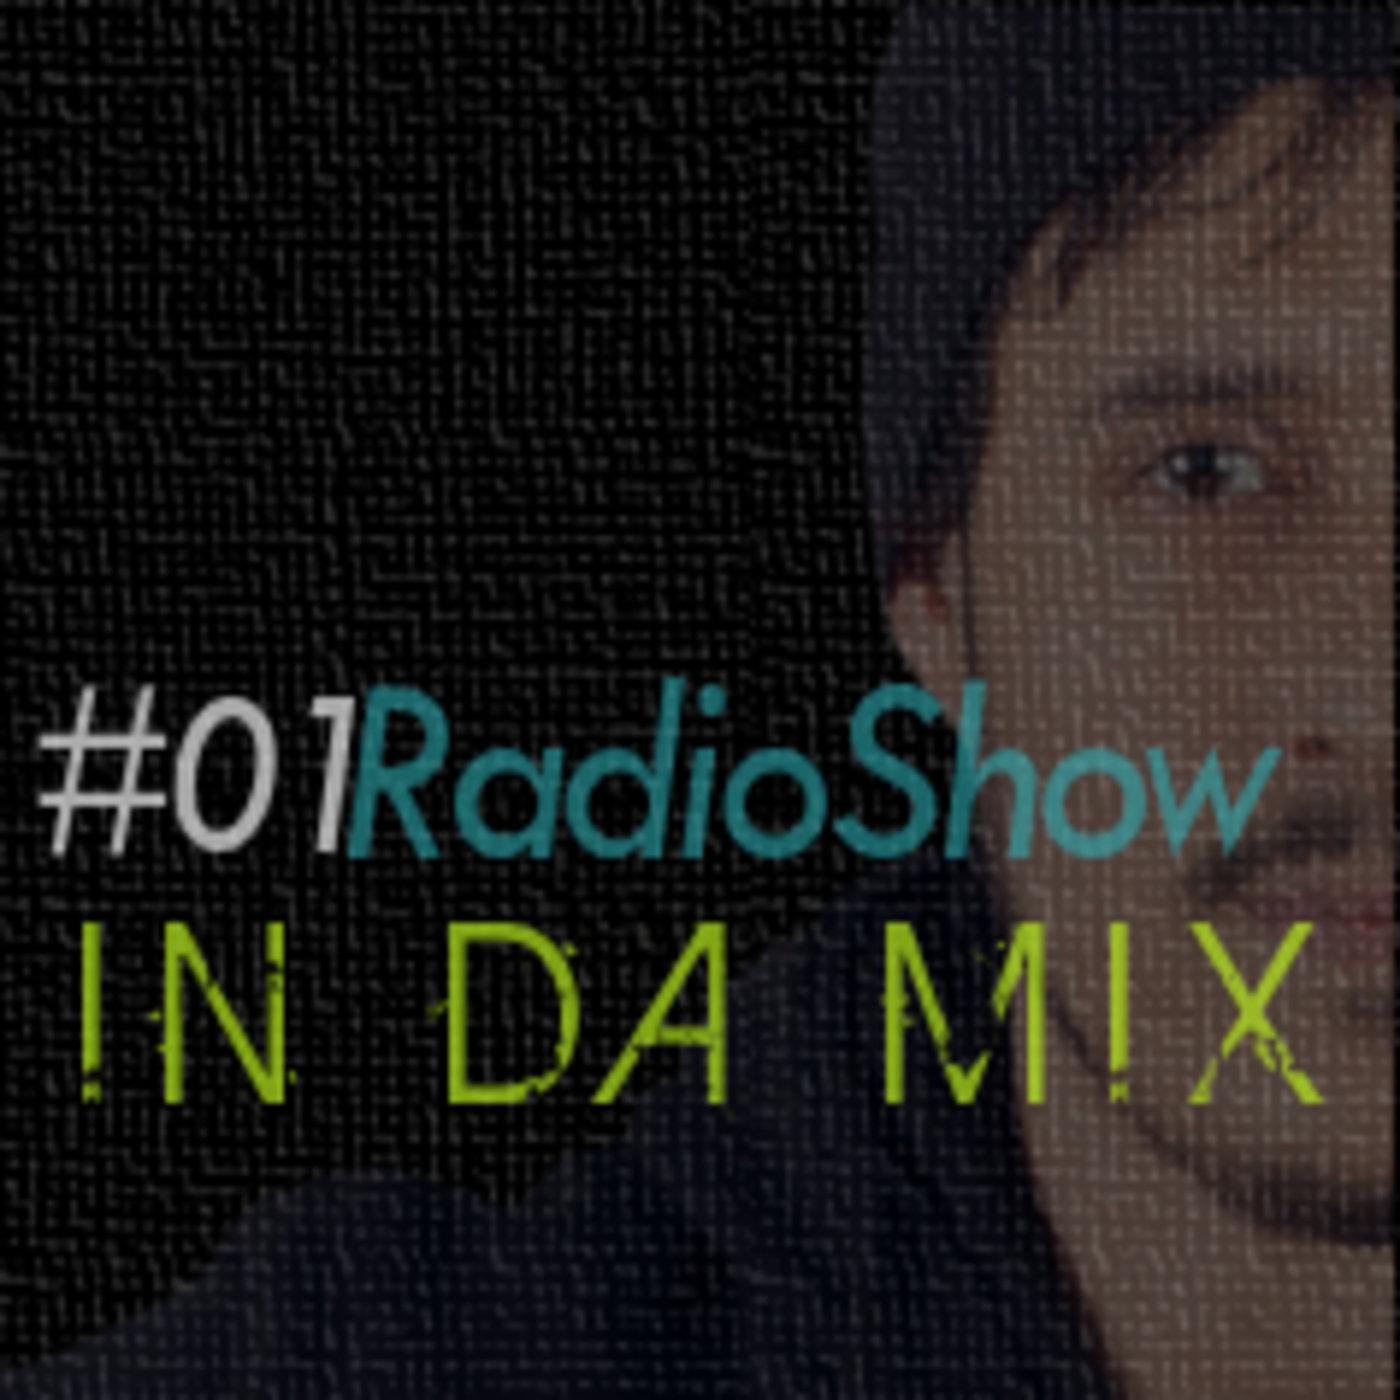 <![CDATA[IN DA MIX Radioshow #01 by Locadisco]]>